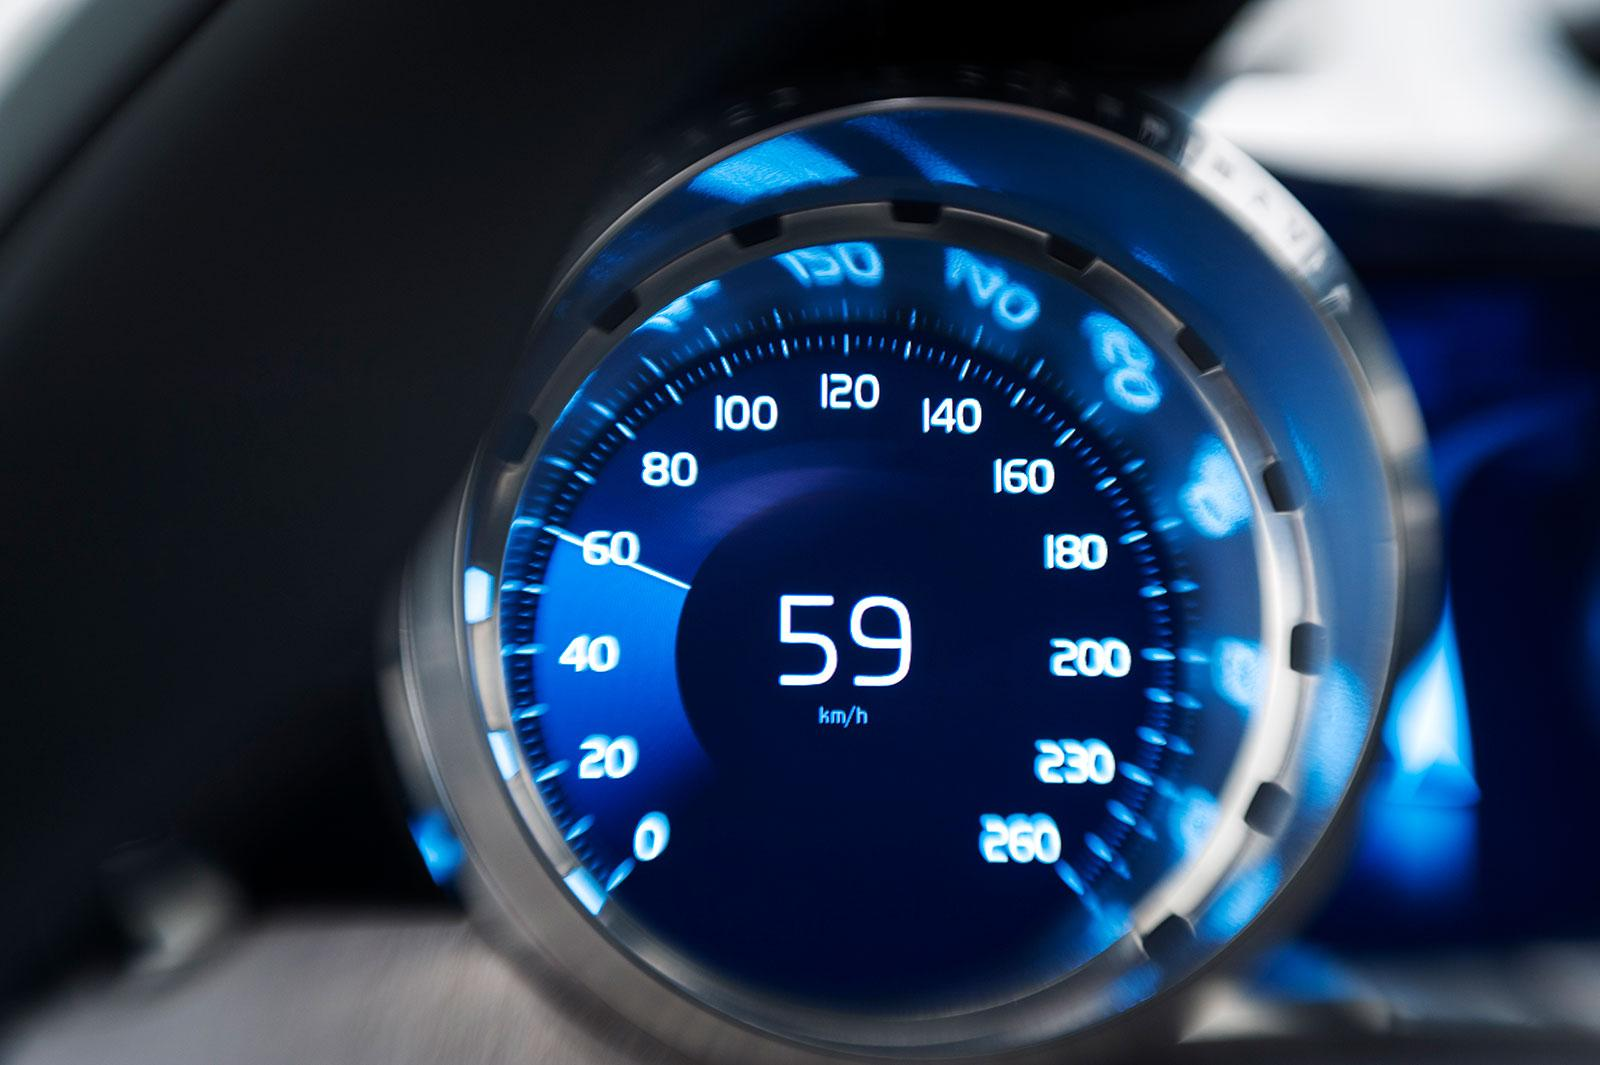 Volvo Concept Coupe Interior - Speedometer design - Car Body Design